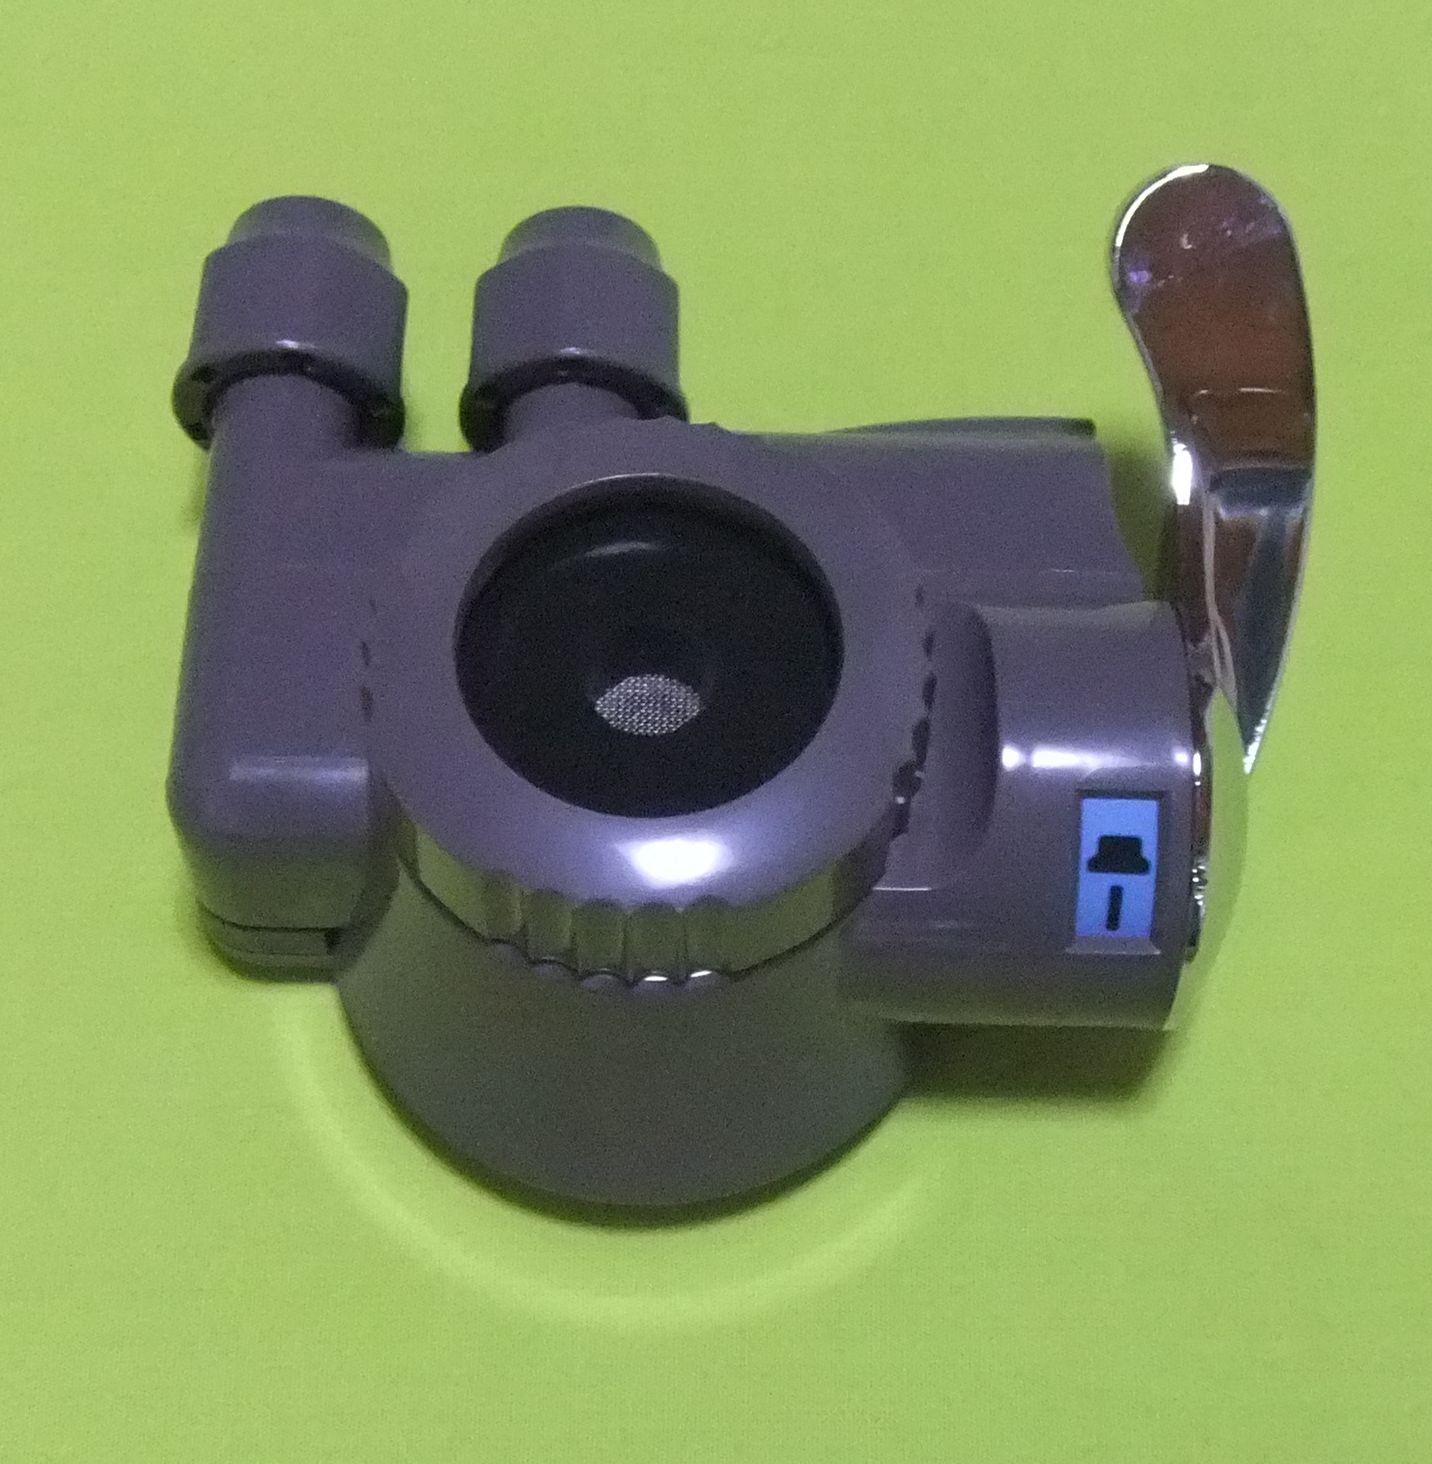 OSGコーポレーション 浄水器 TWINe ツインe ツインイー用切替コック